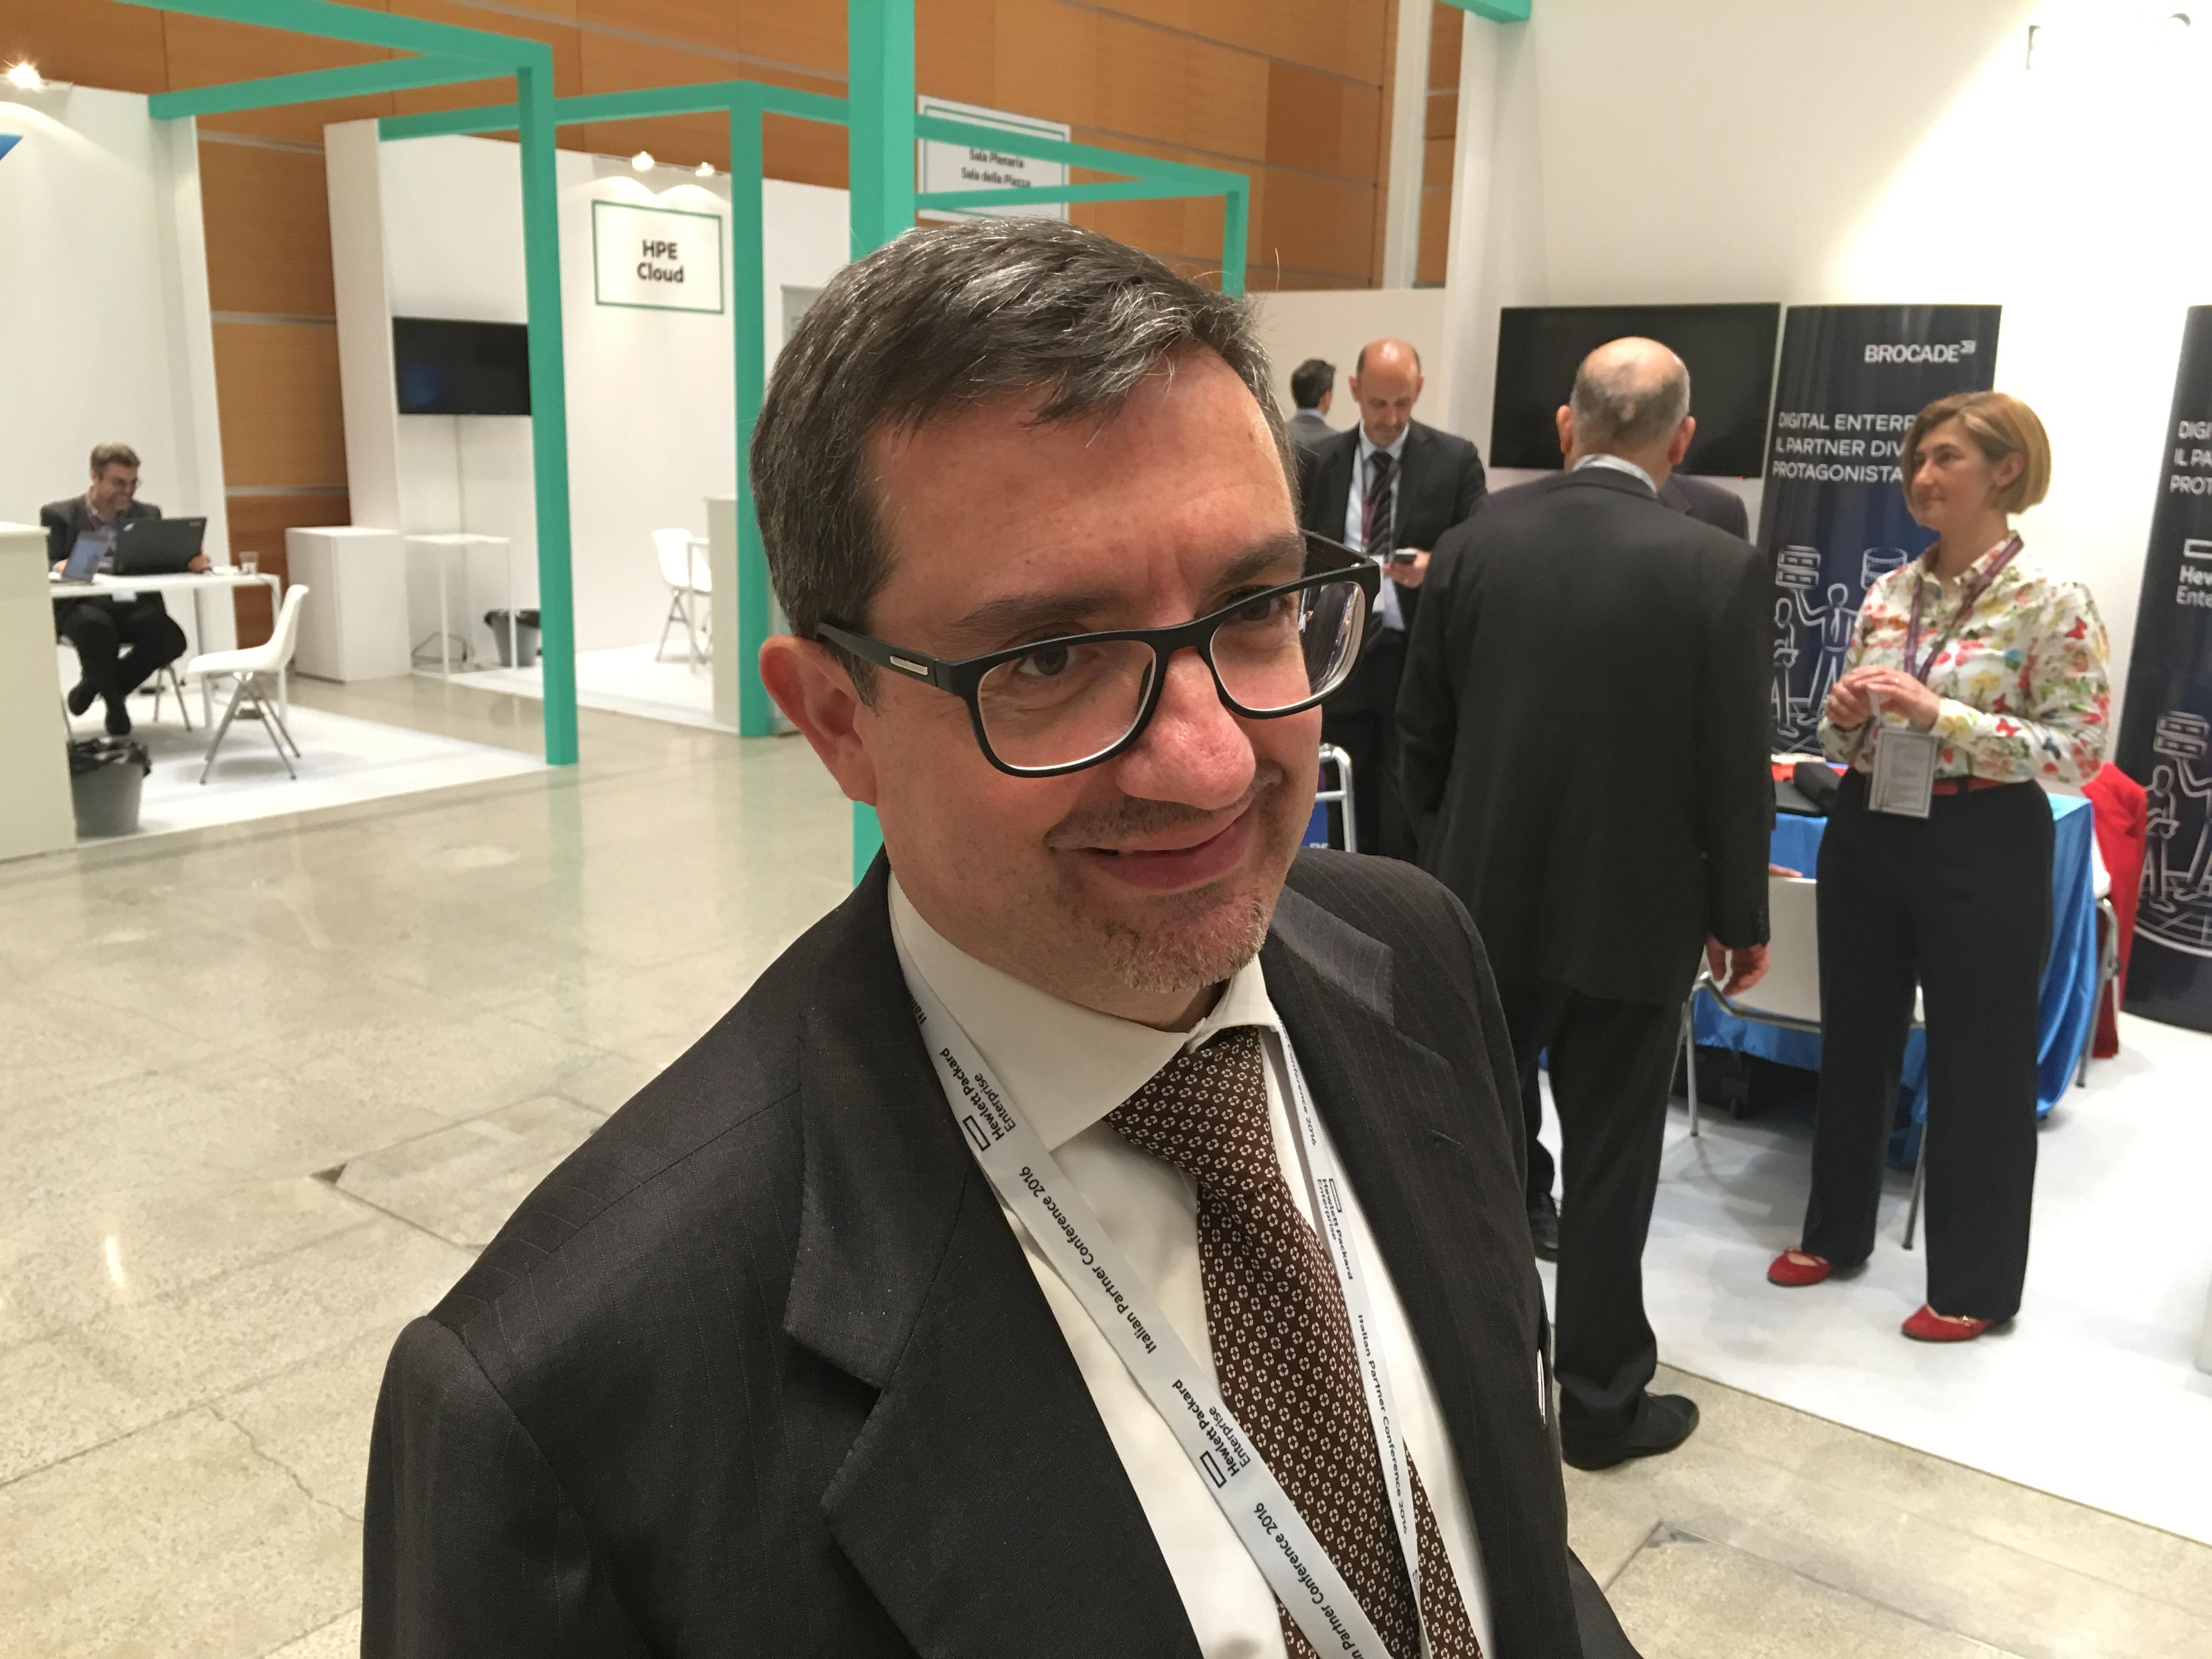 Alberto Roseo, Managing Director at Lutech Spa